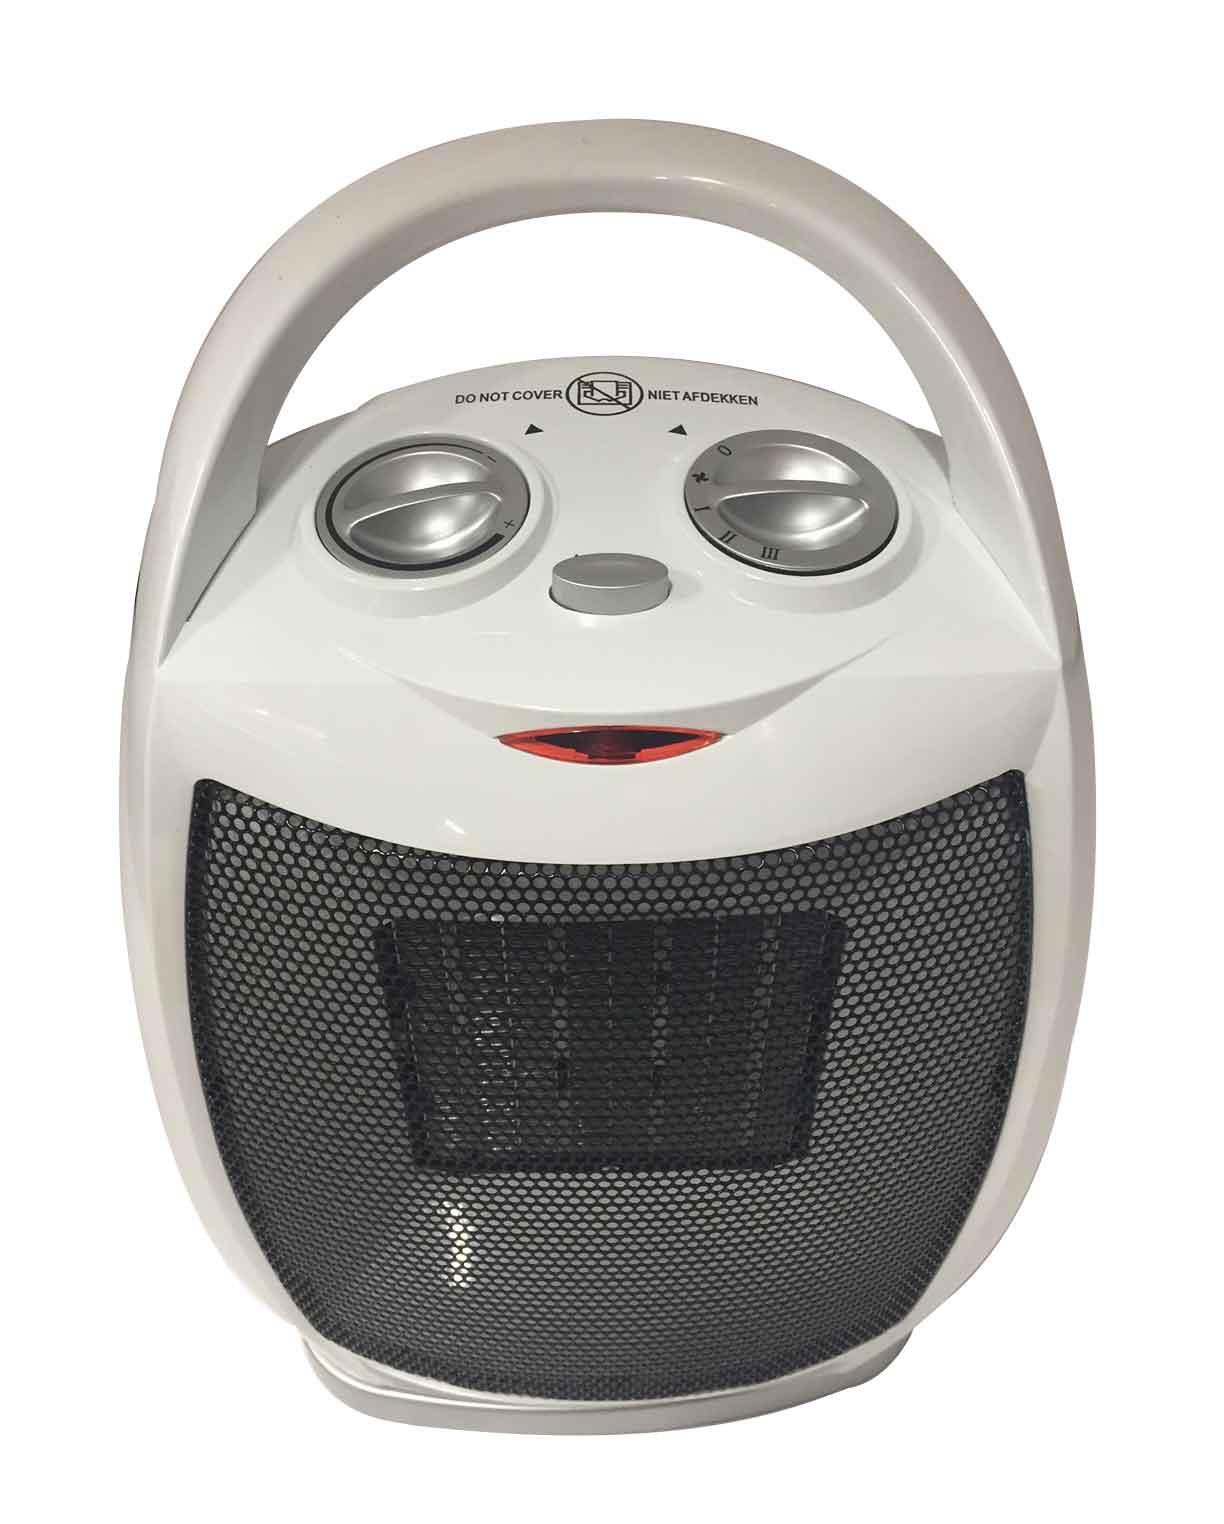 radiateur ceramique 230v chauffage oscillant 3 puissances. Black Bedroom Furniture Sets. Home Design Ideas